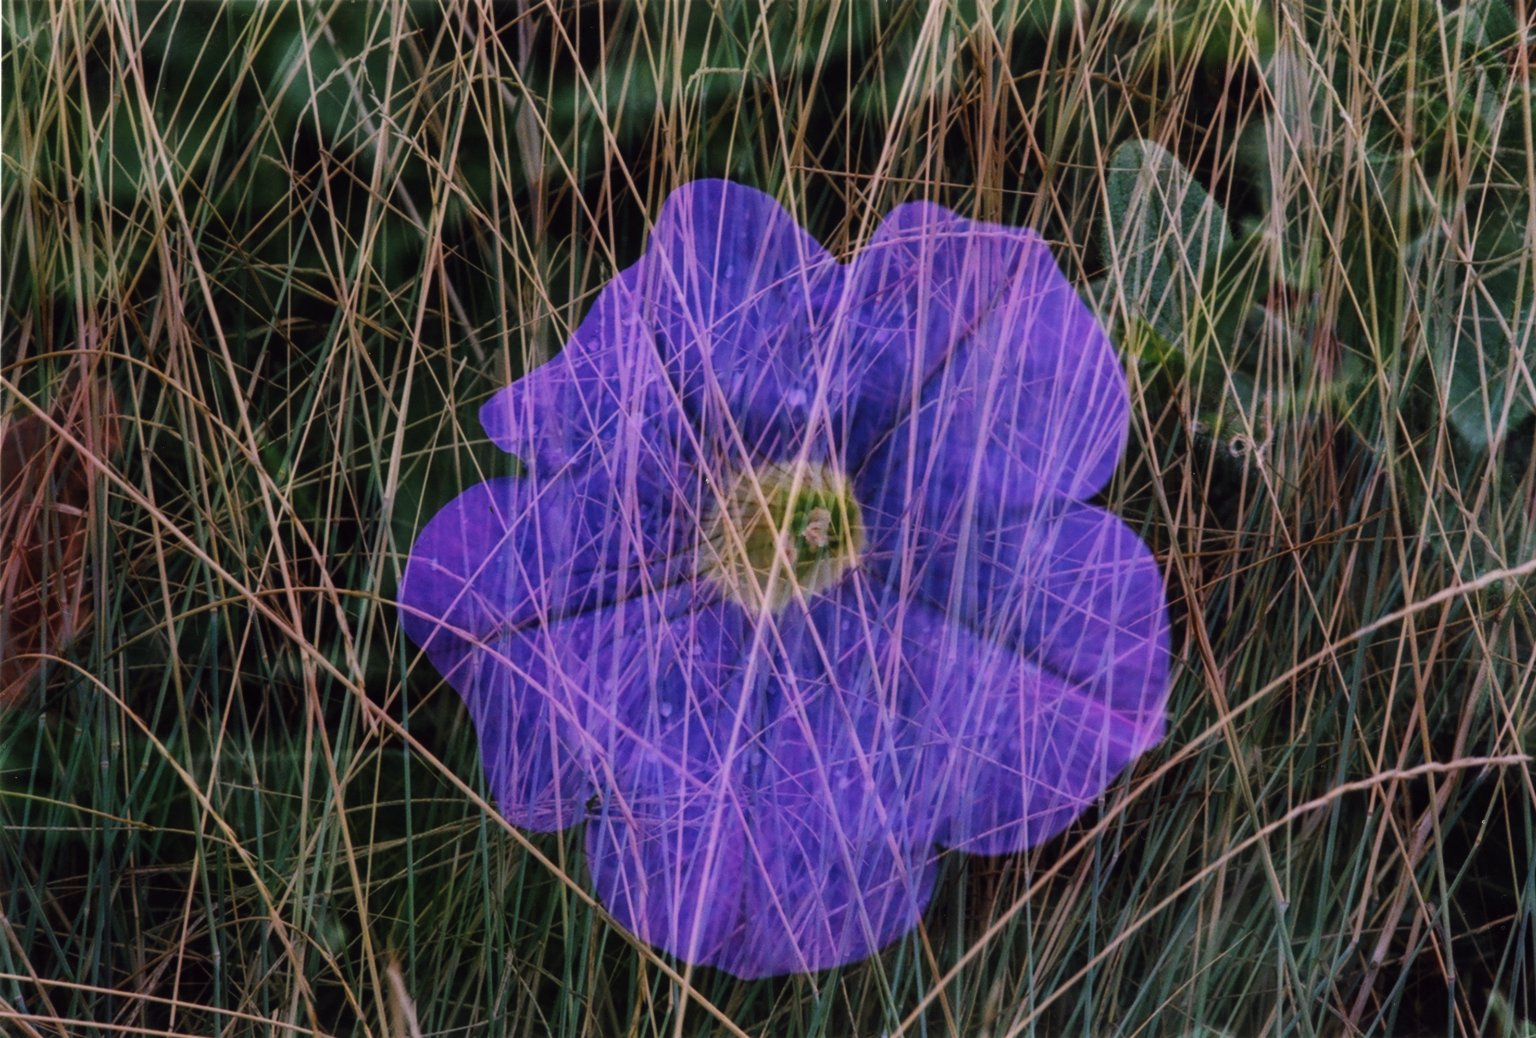 Double Exposure- Purple flower over grass stalks